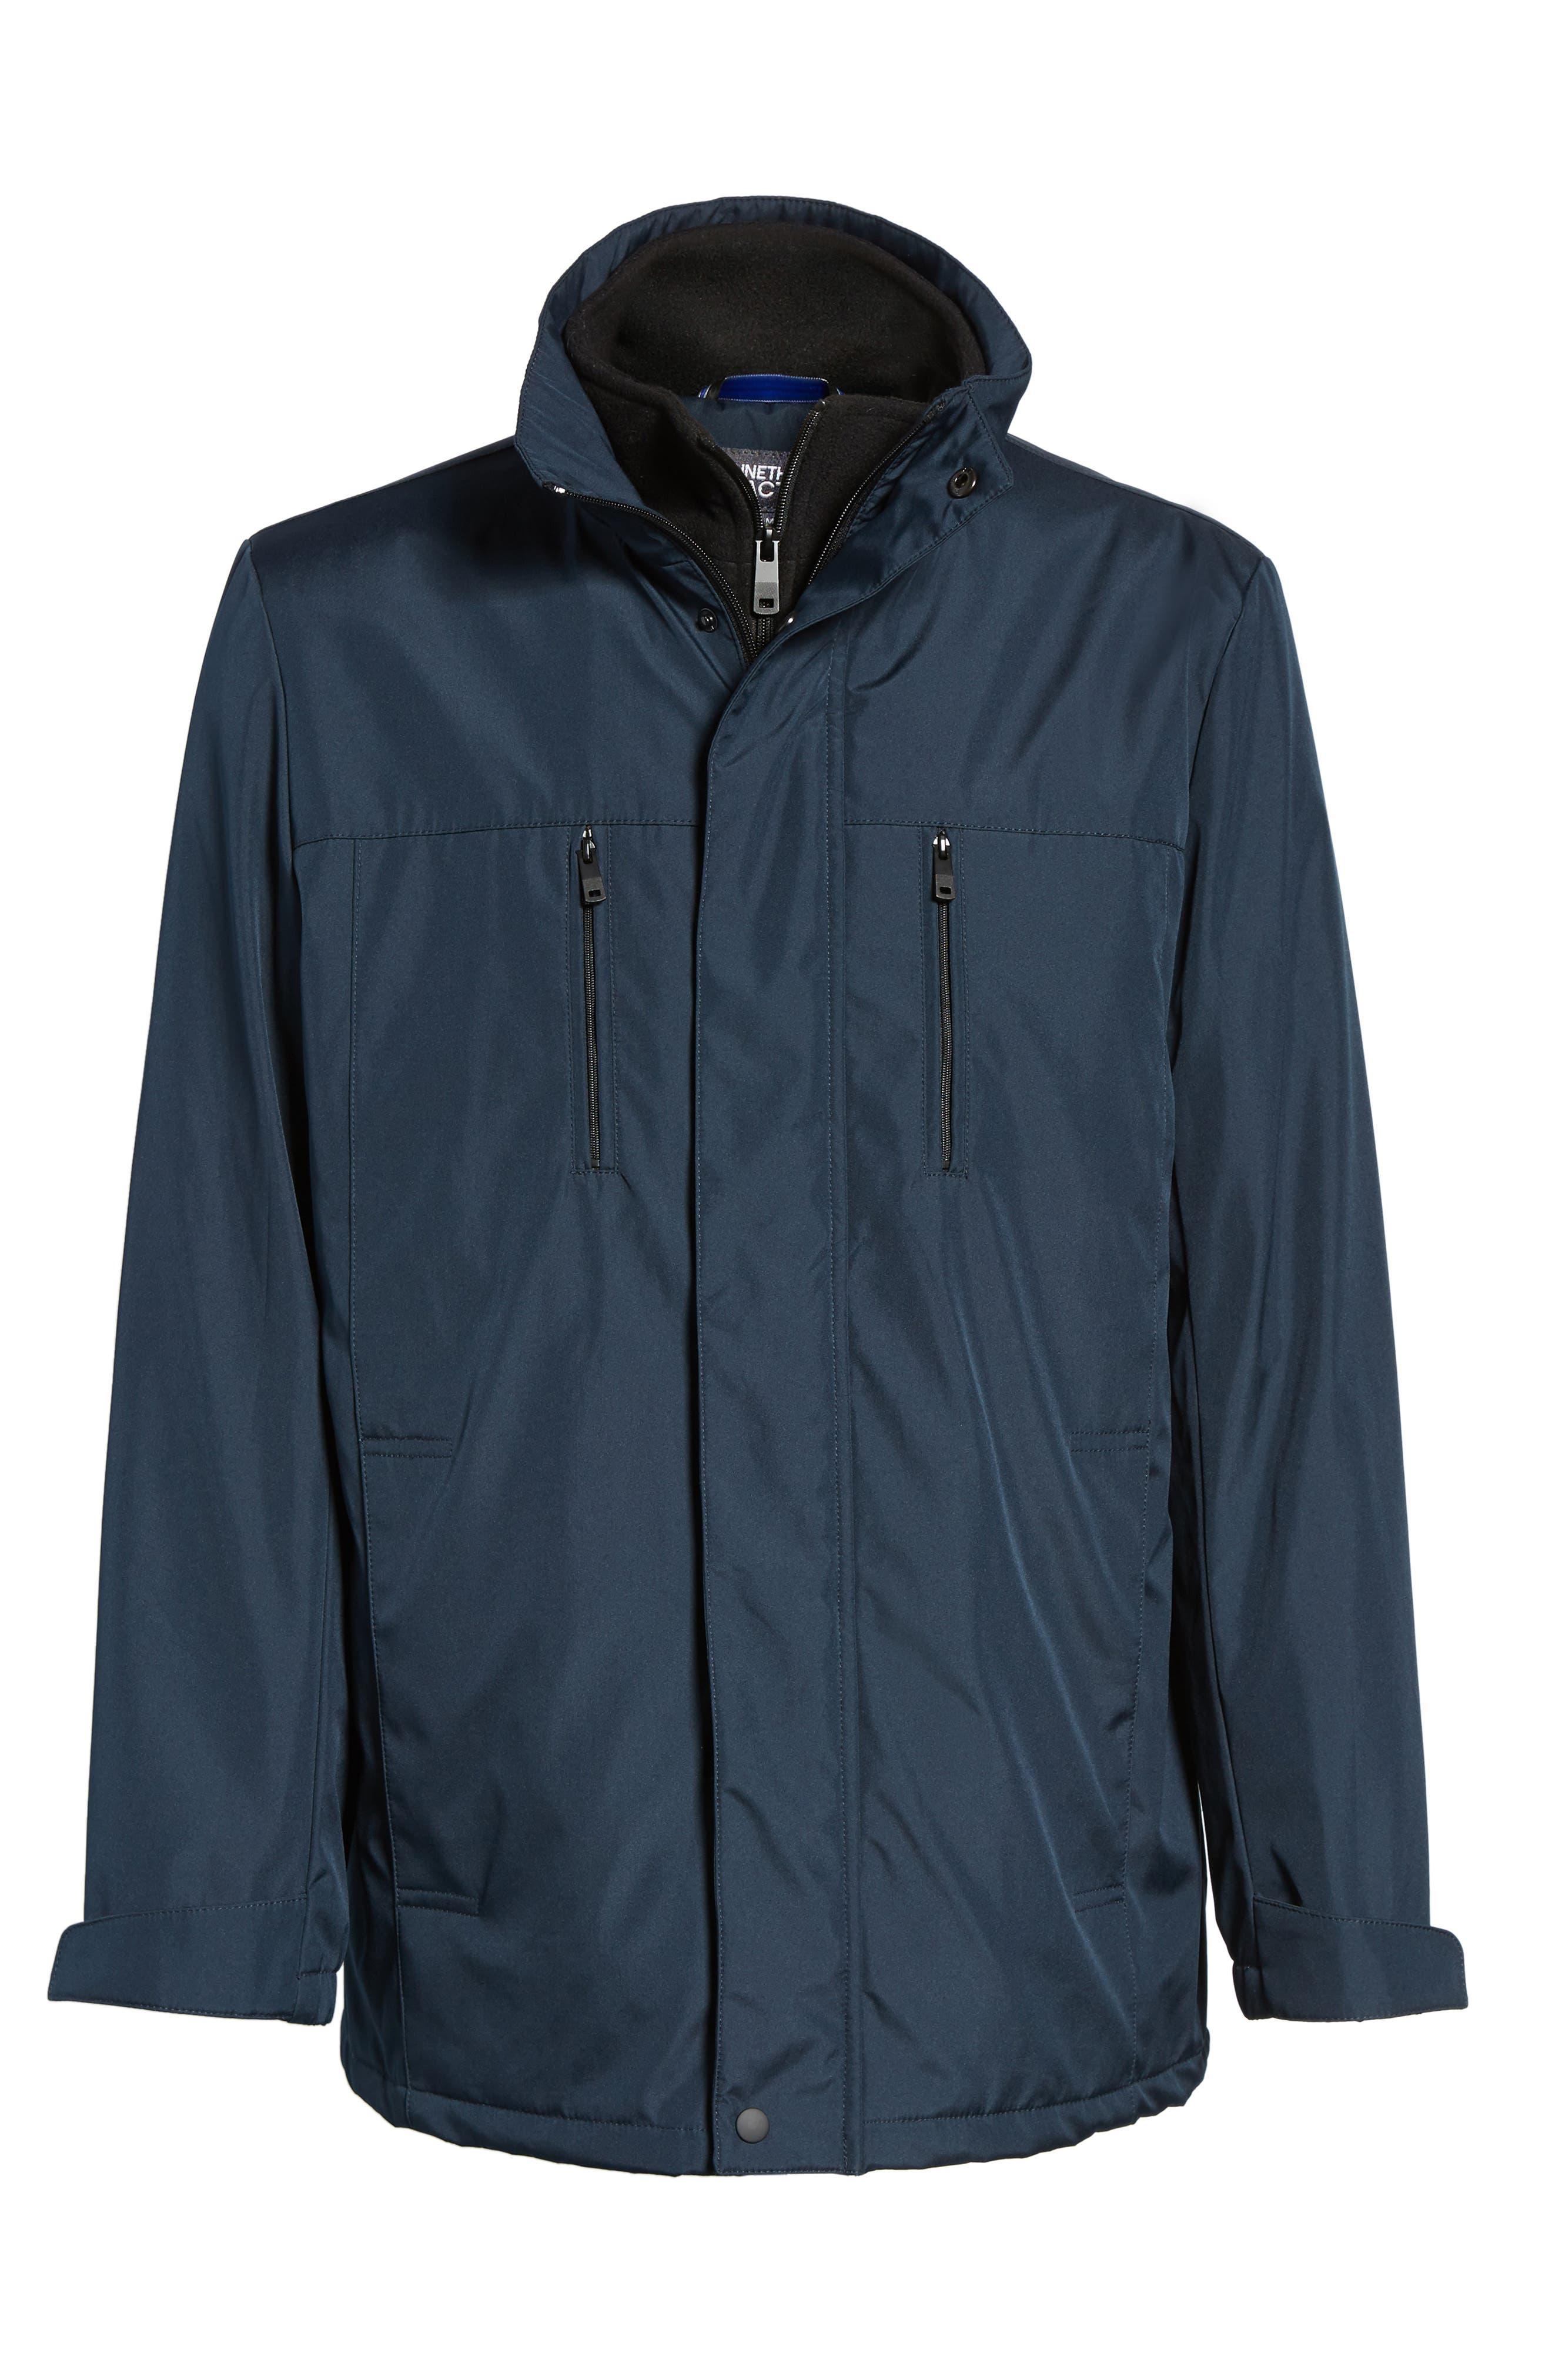 Hooded Jacket with Inset Fleece Bib,                             Alternate thumbnail 20, color,